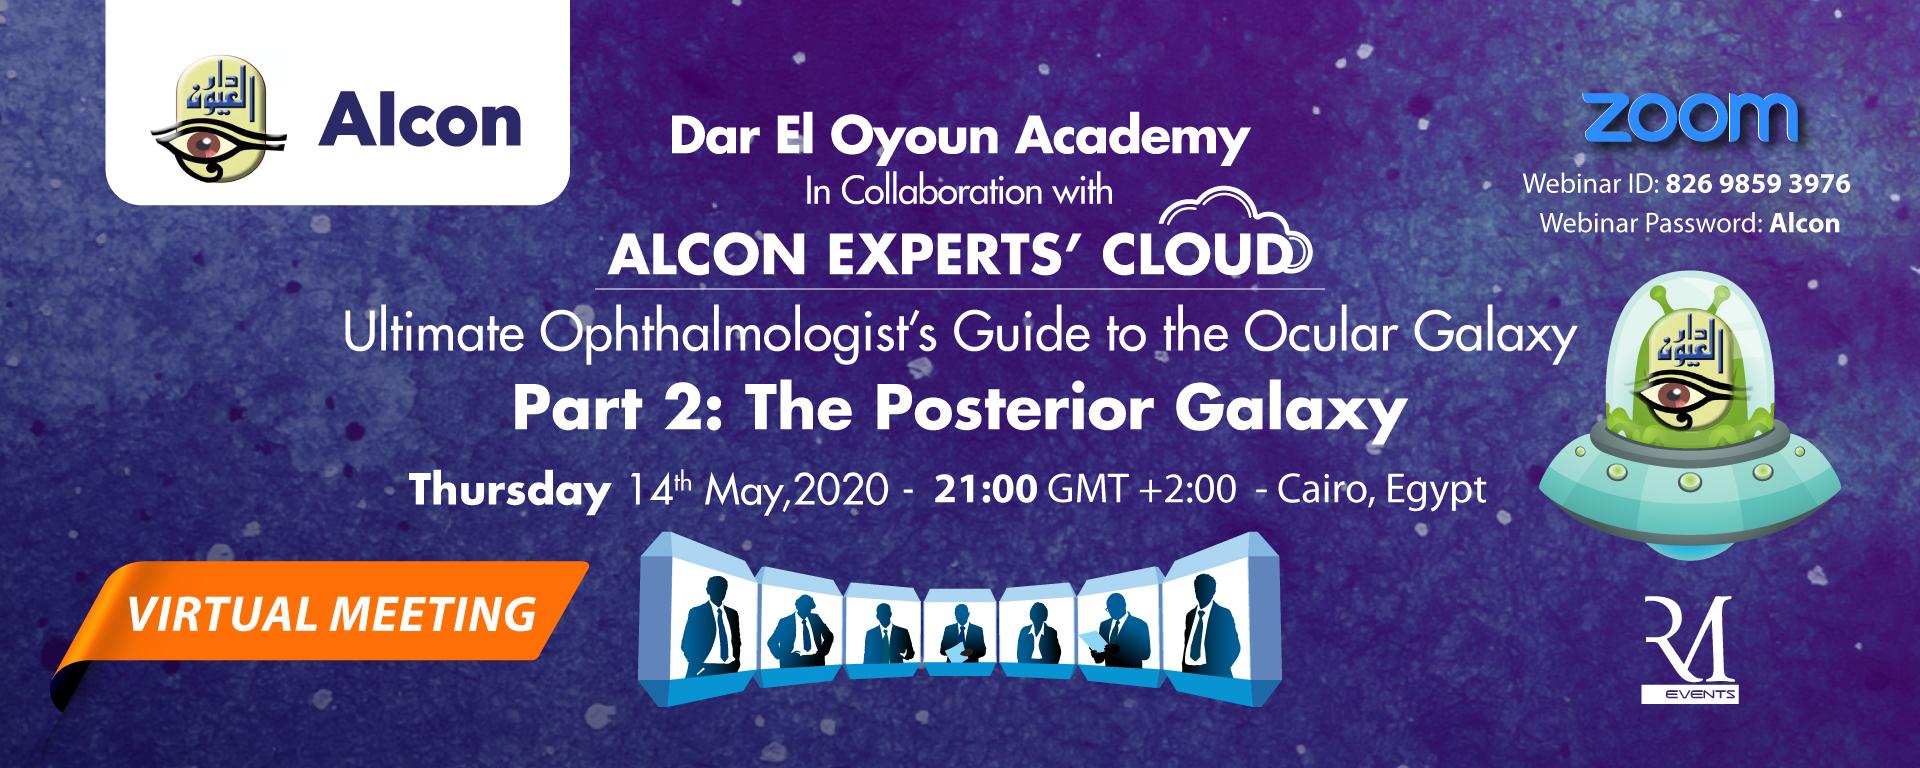 "Dar El Oyoun Academy In Collaboration with ""ALCON EXPERTS' CLOUD"""